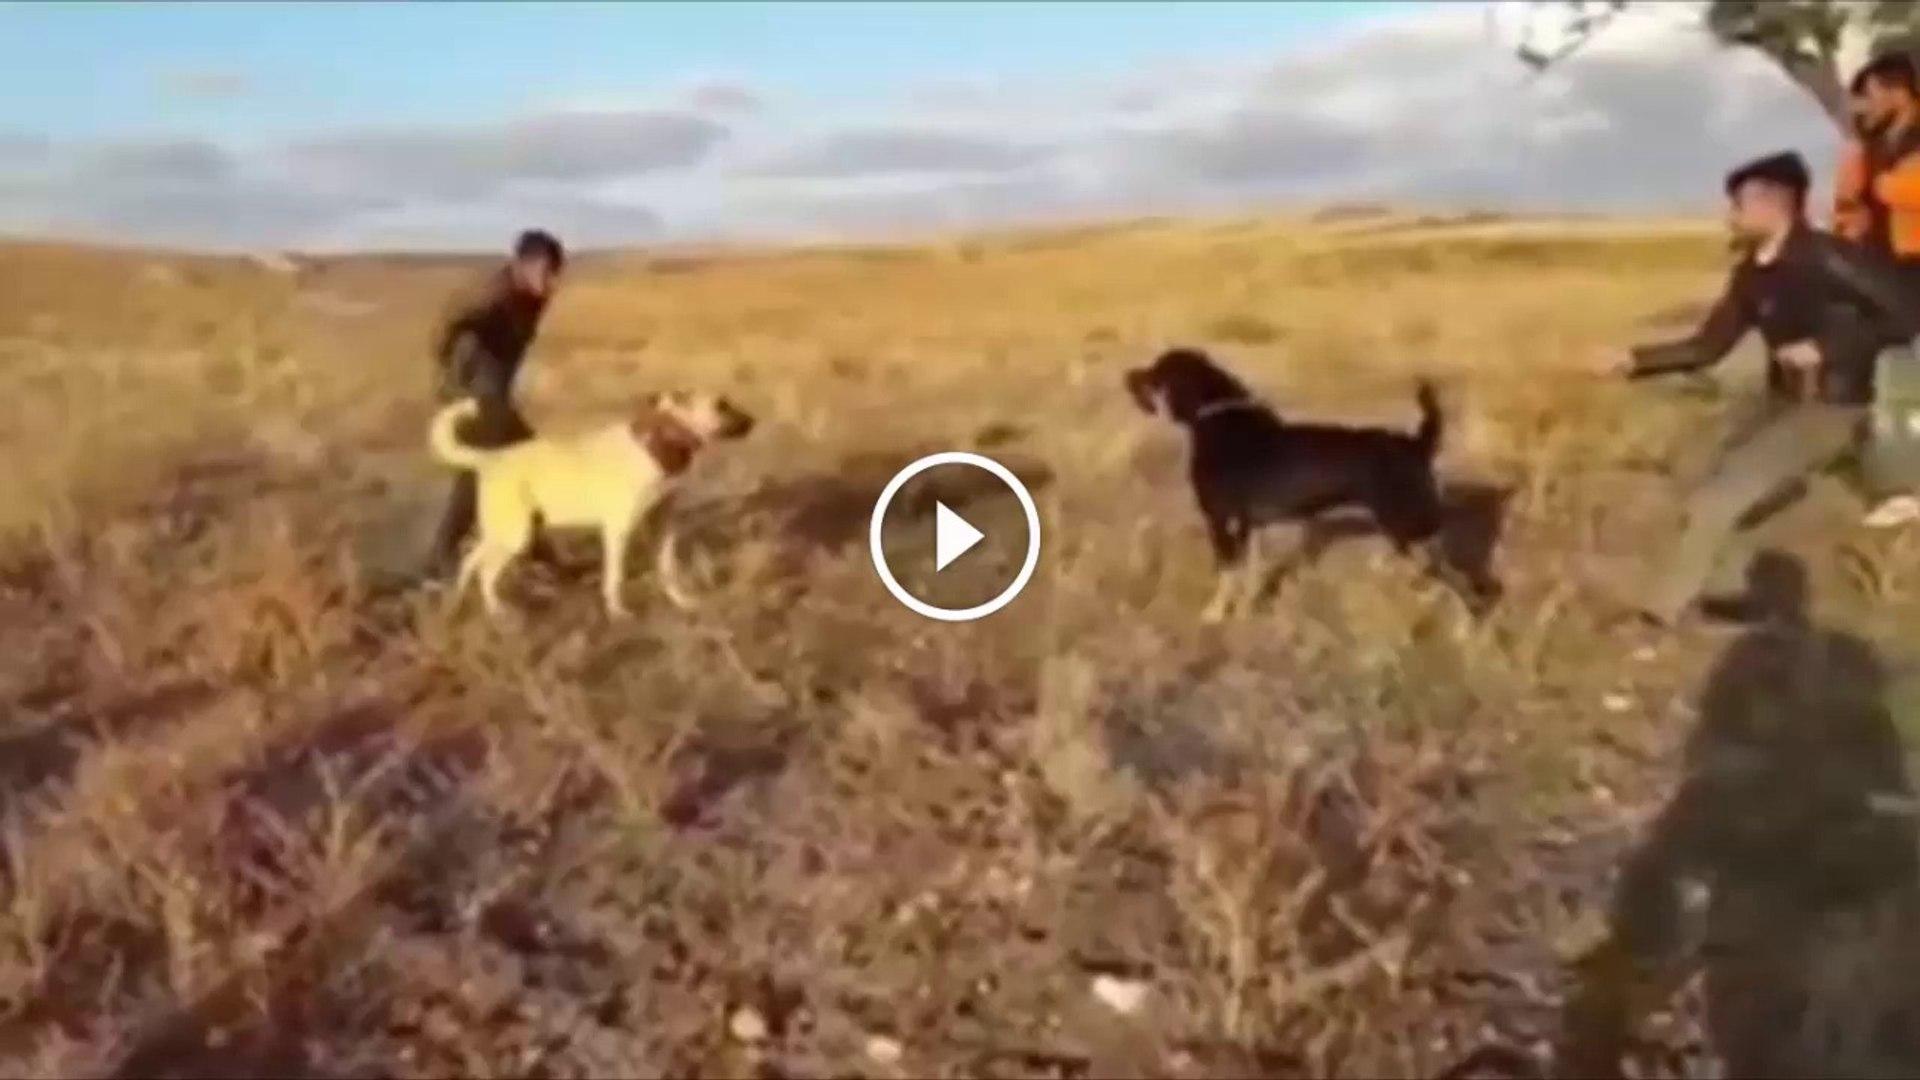 SiVAS KANGAL KOPEGi vs ROTWAiLLER - ANATOLiAN SHEPHERD KANGAL DOG vs ROTWEiLLER DOG